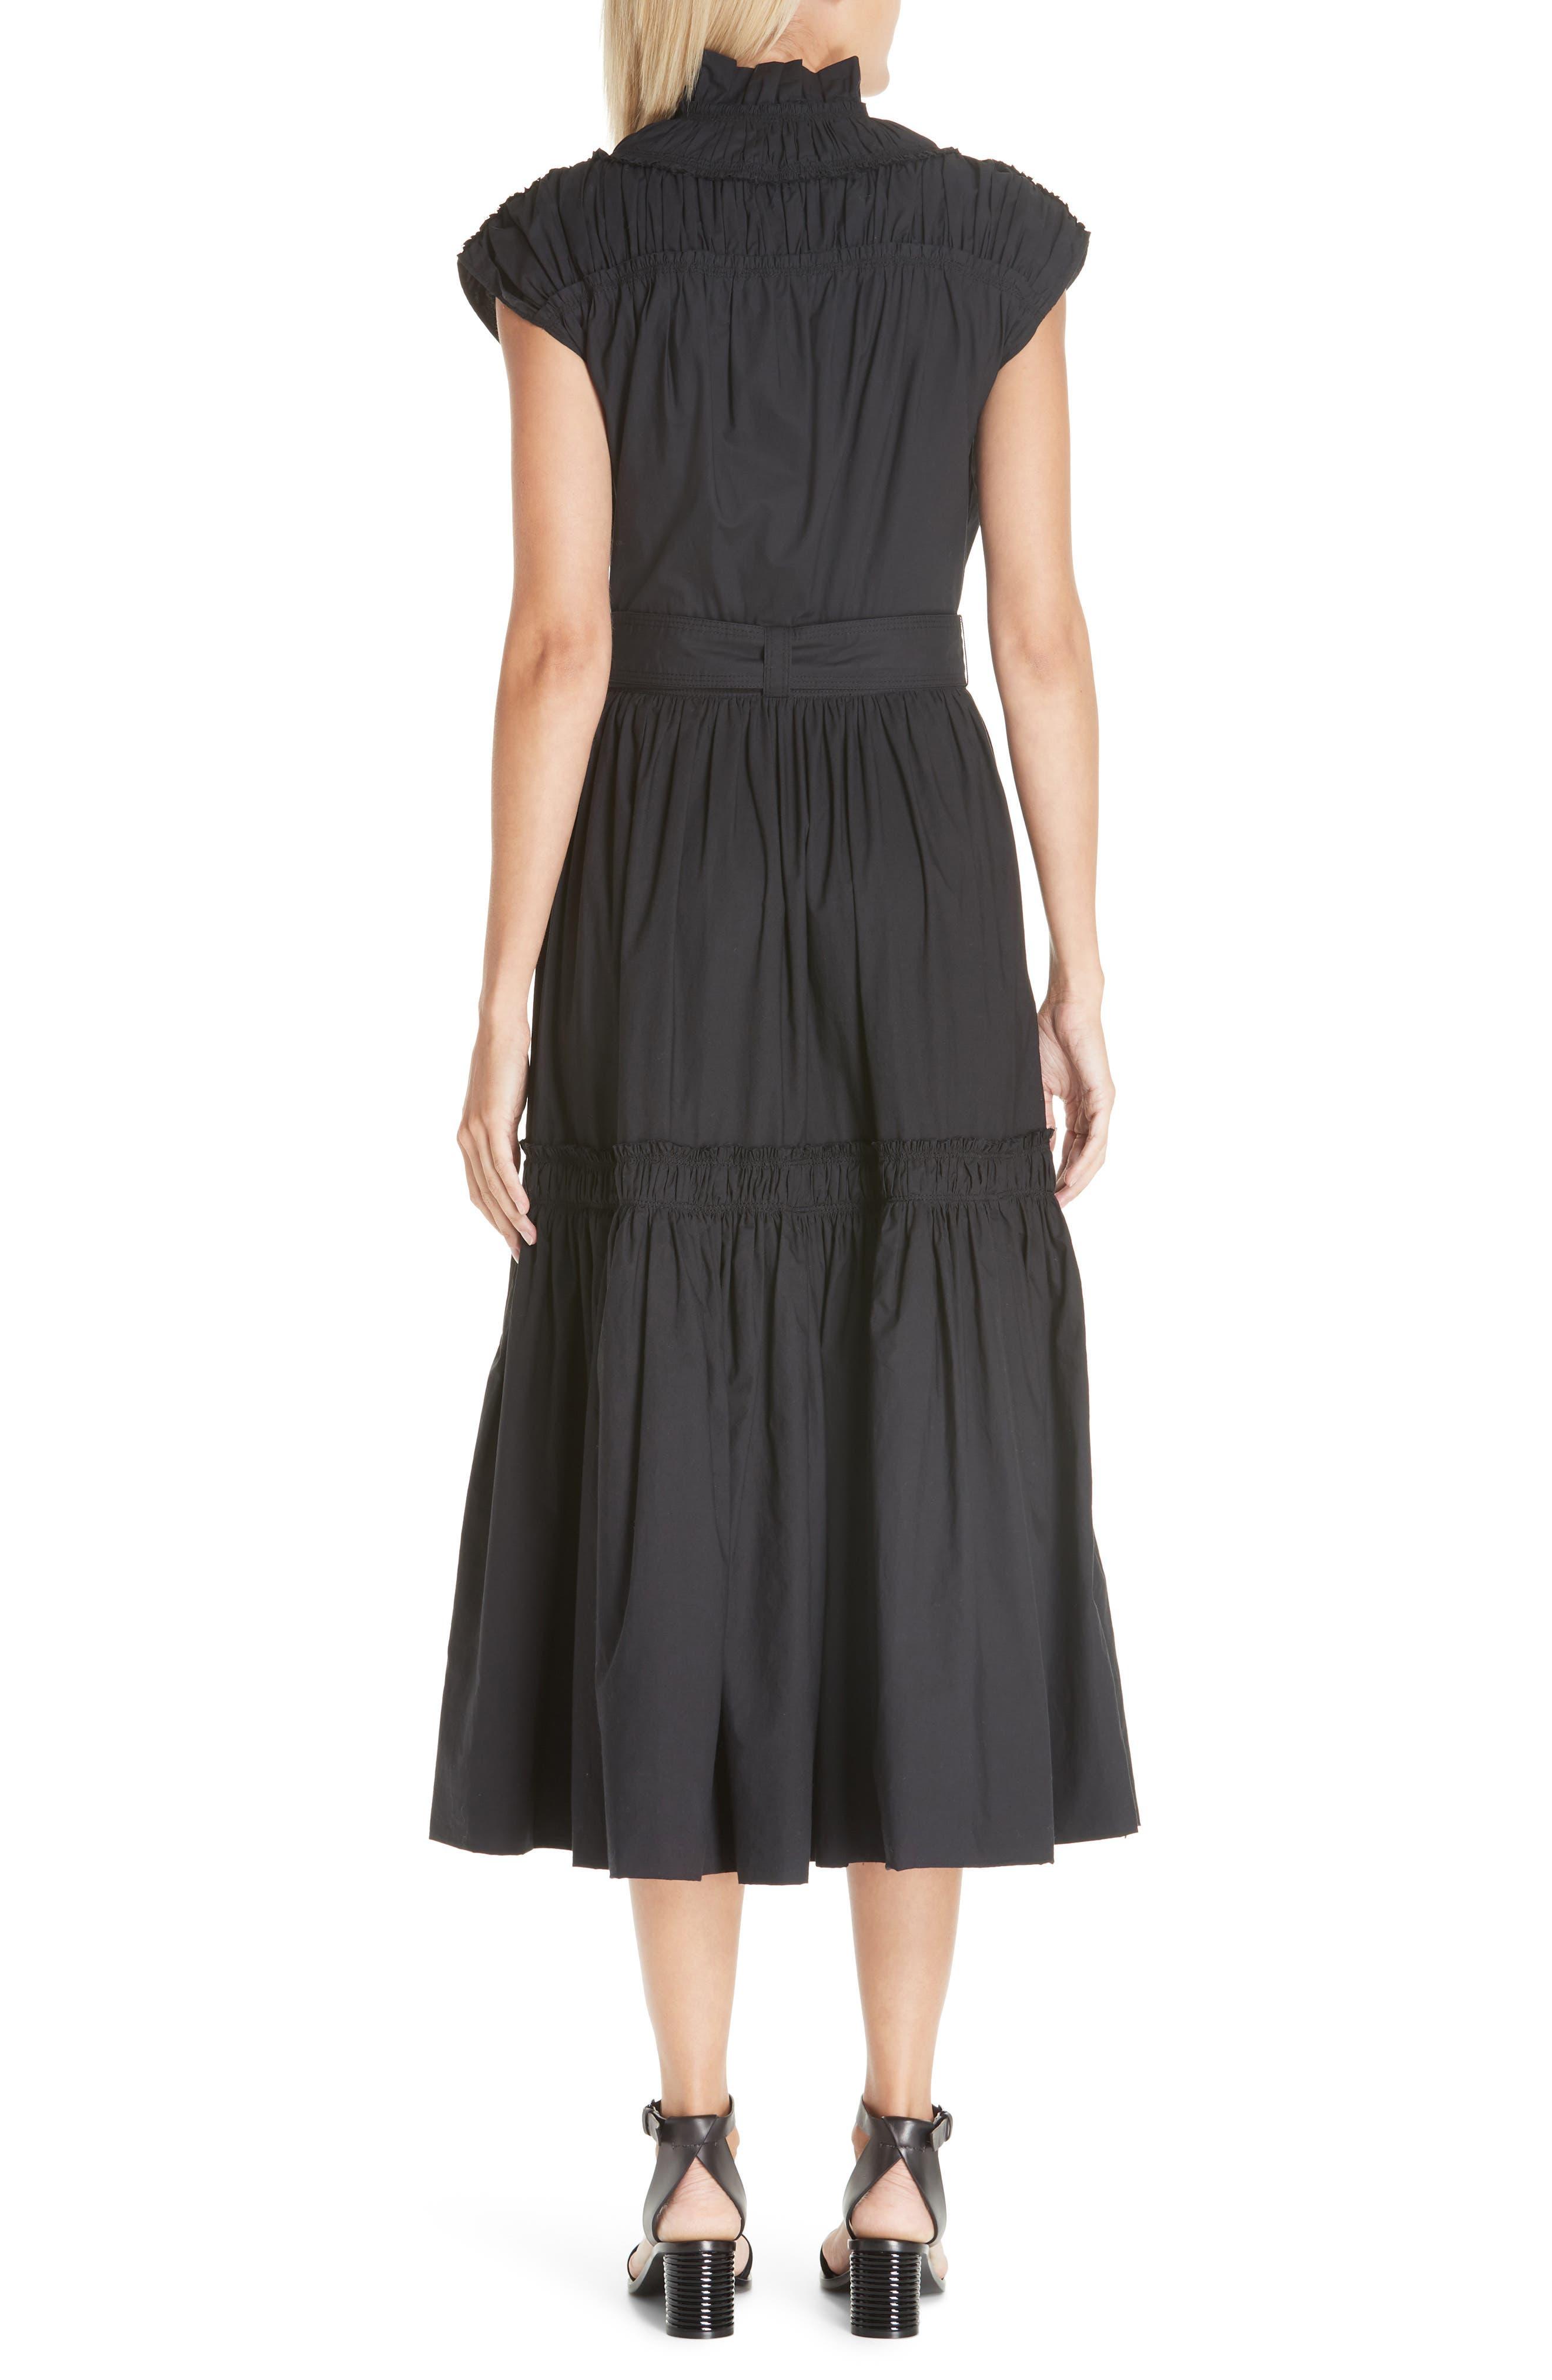 PROENZA SCHOULER, Smocked Poplin Dress, Alternate thumbnail 2, color, BLACK